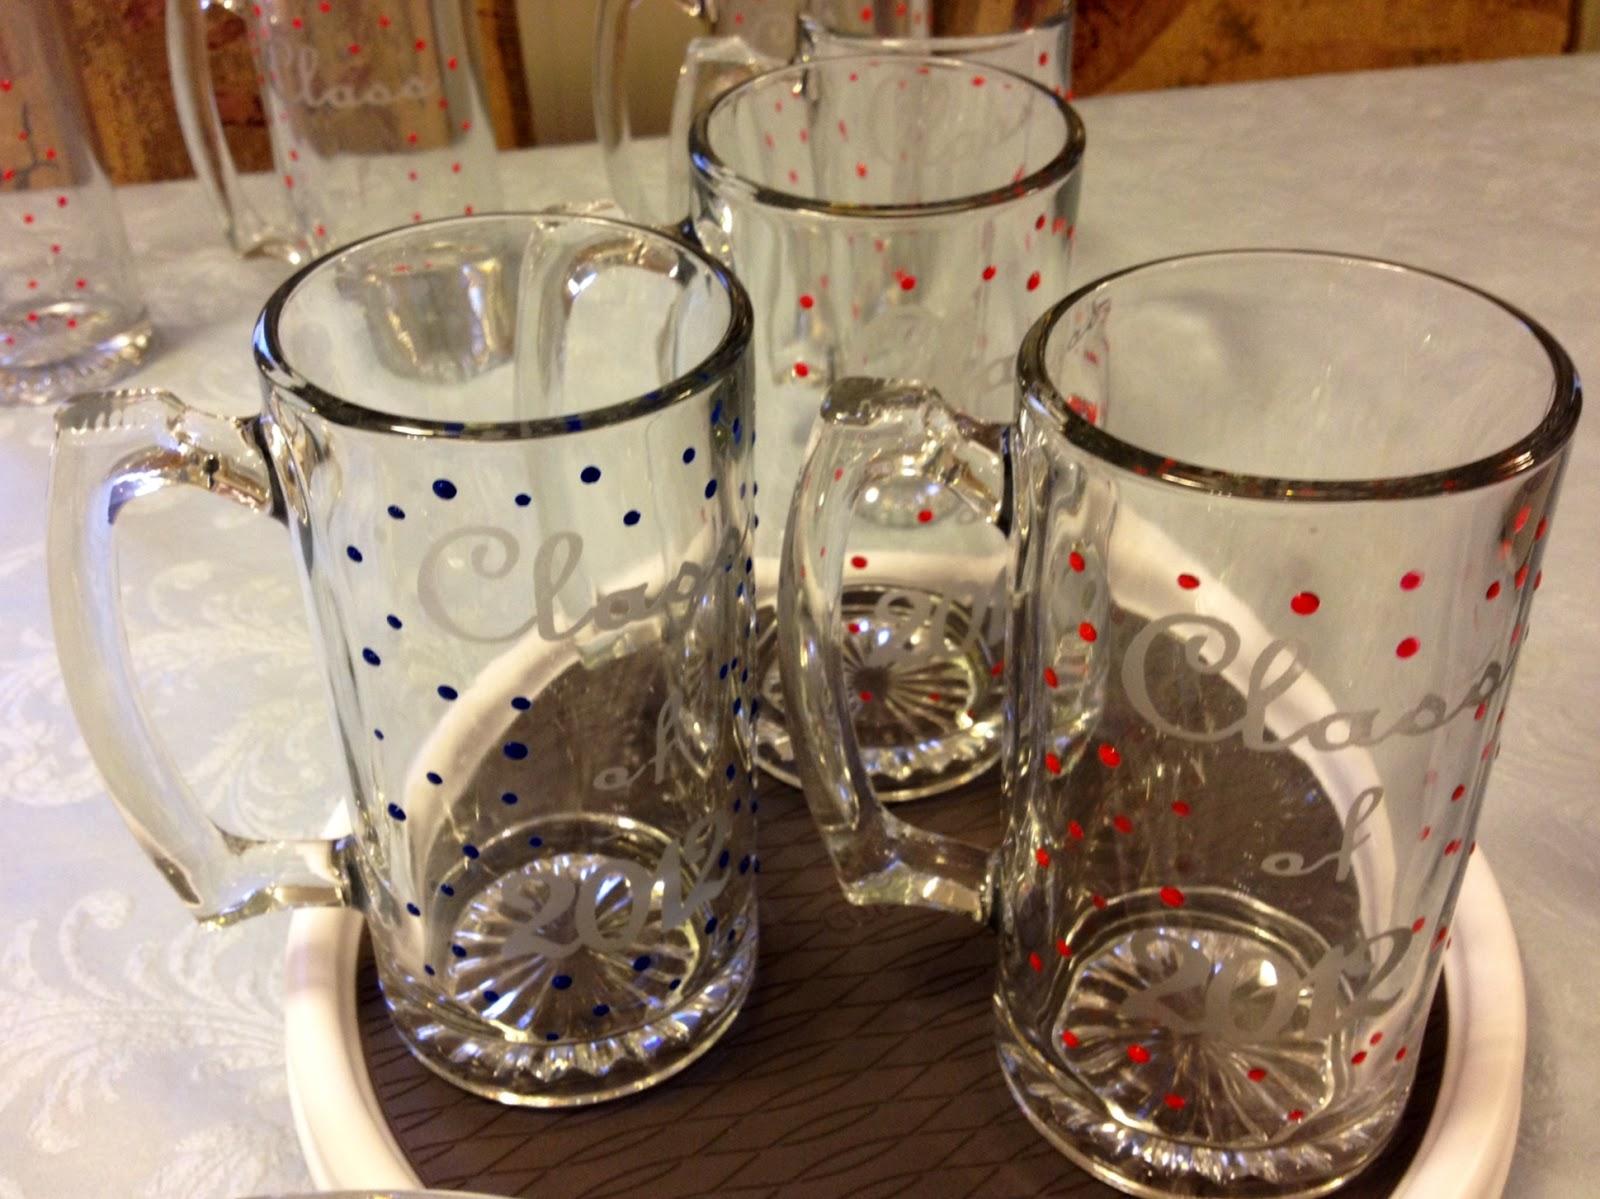 marilyn 39 s crafts diy graduation mugs glass etching. Black Bedroom Furniture Sets. Home Design Ideas